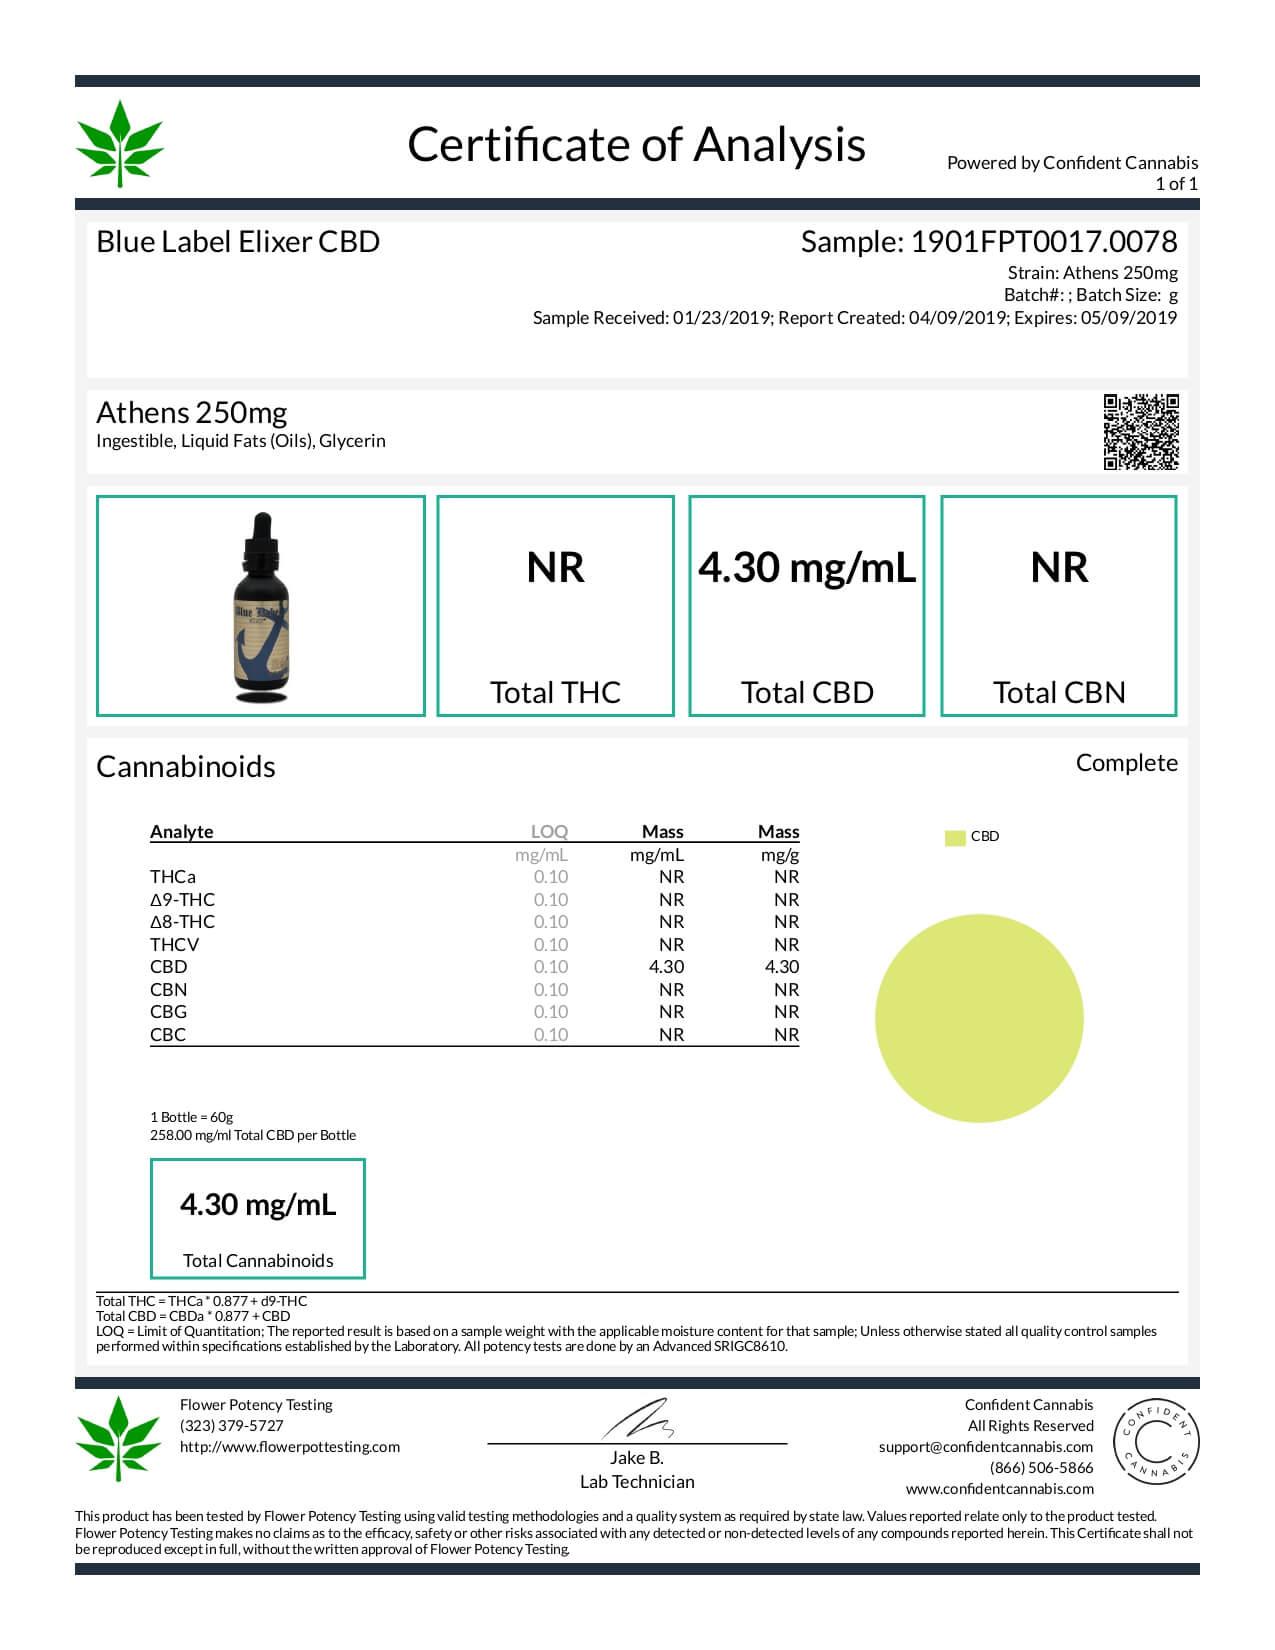 Blue Label CBD Vape Juice Athens 250mg Lab Report